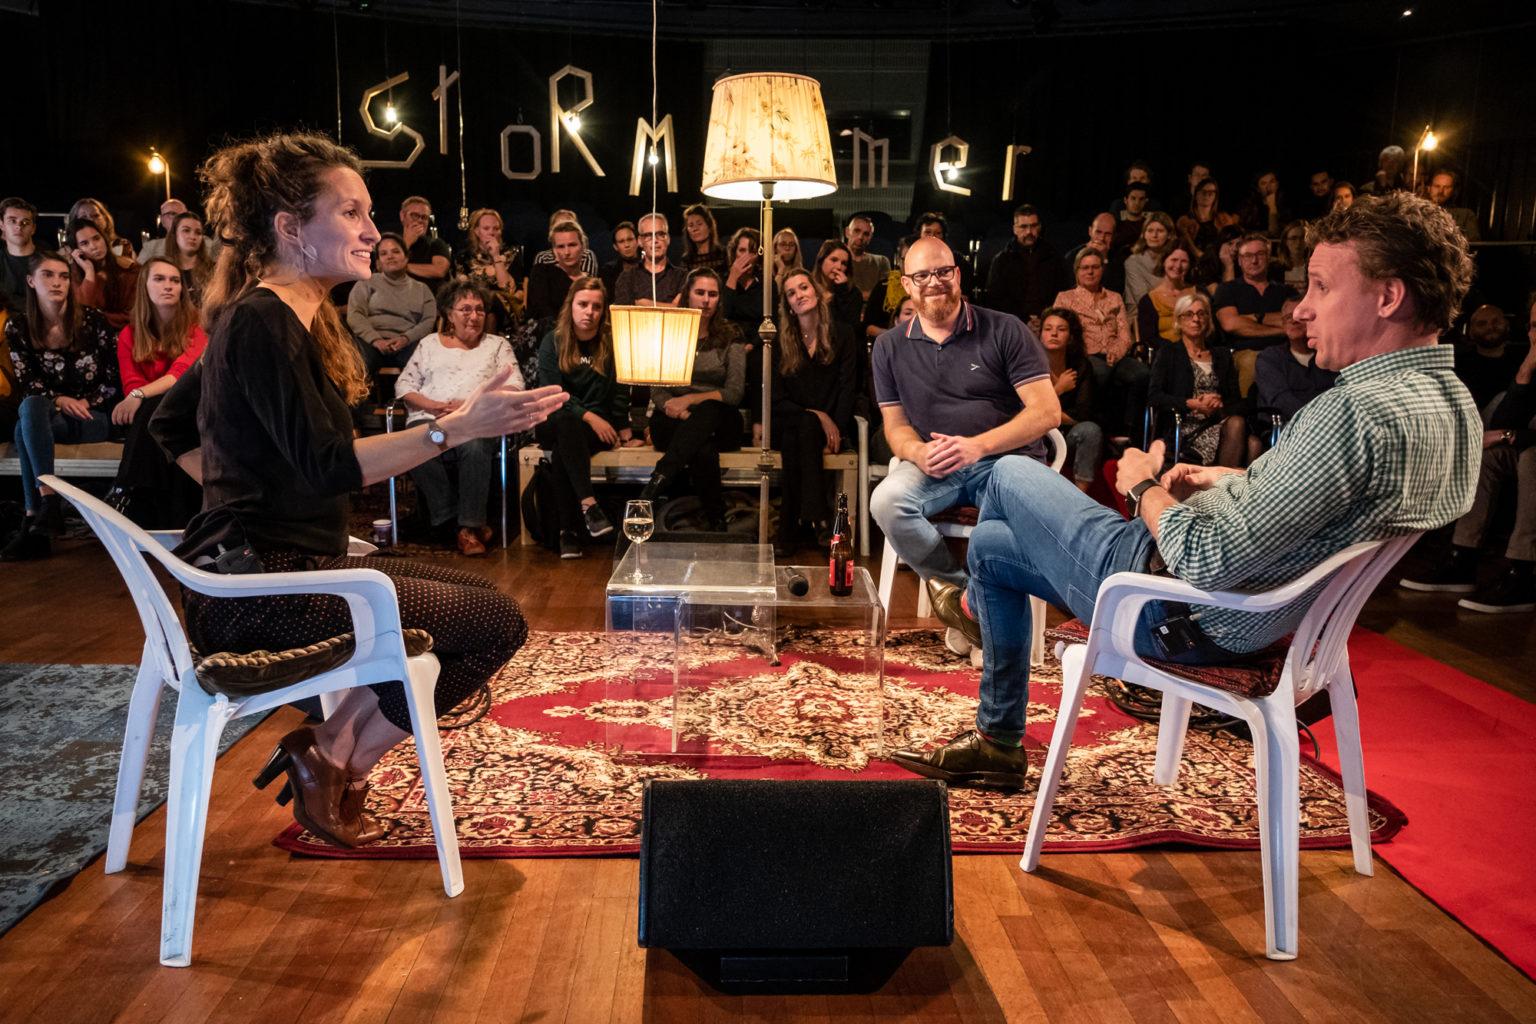 Stormkamer_TheatersTilburg_lores_WilliamvanderVoort-025